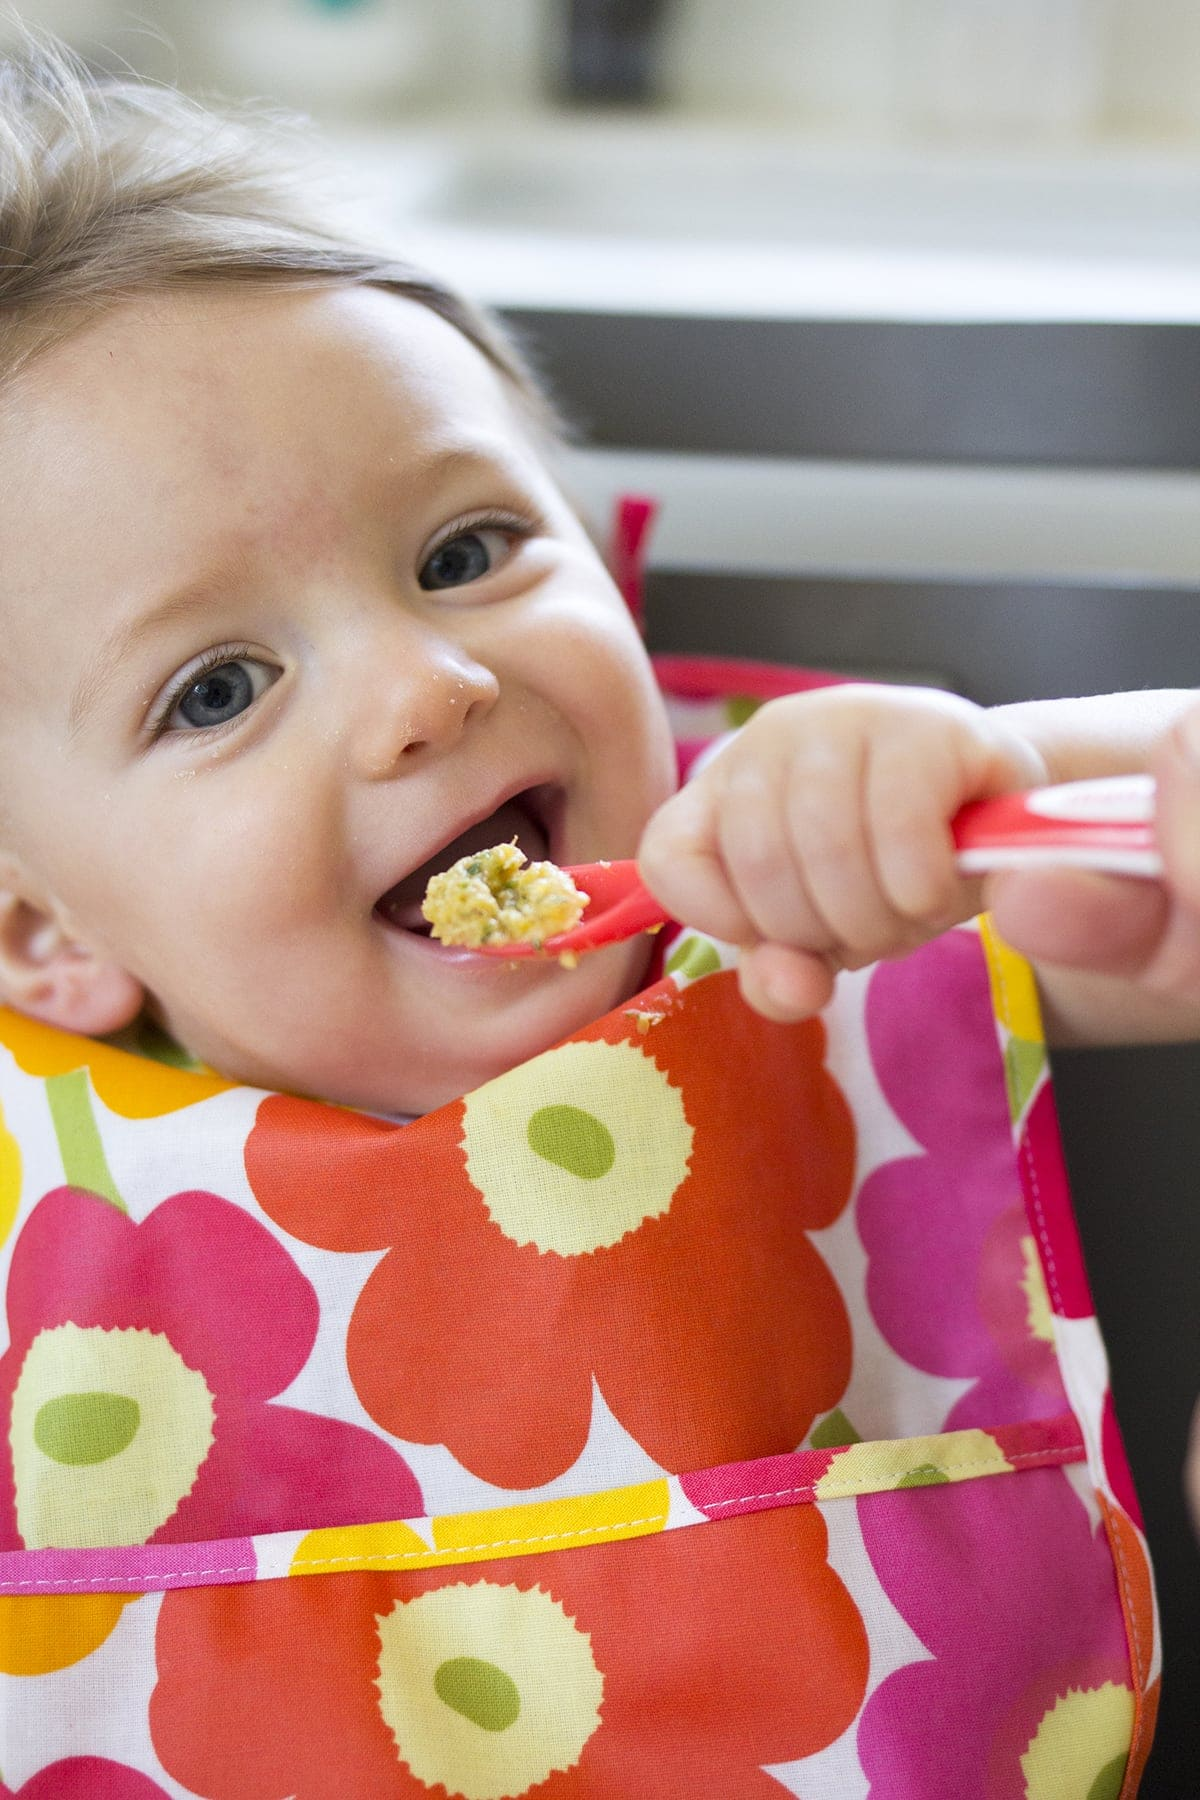 Lunch Ideas for Babies Spoon Feeding